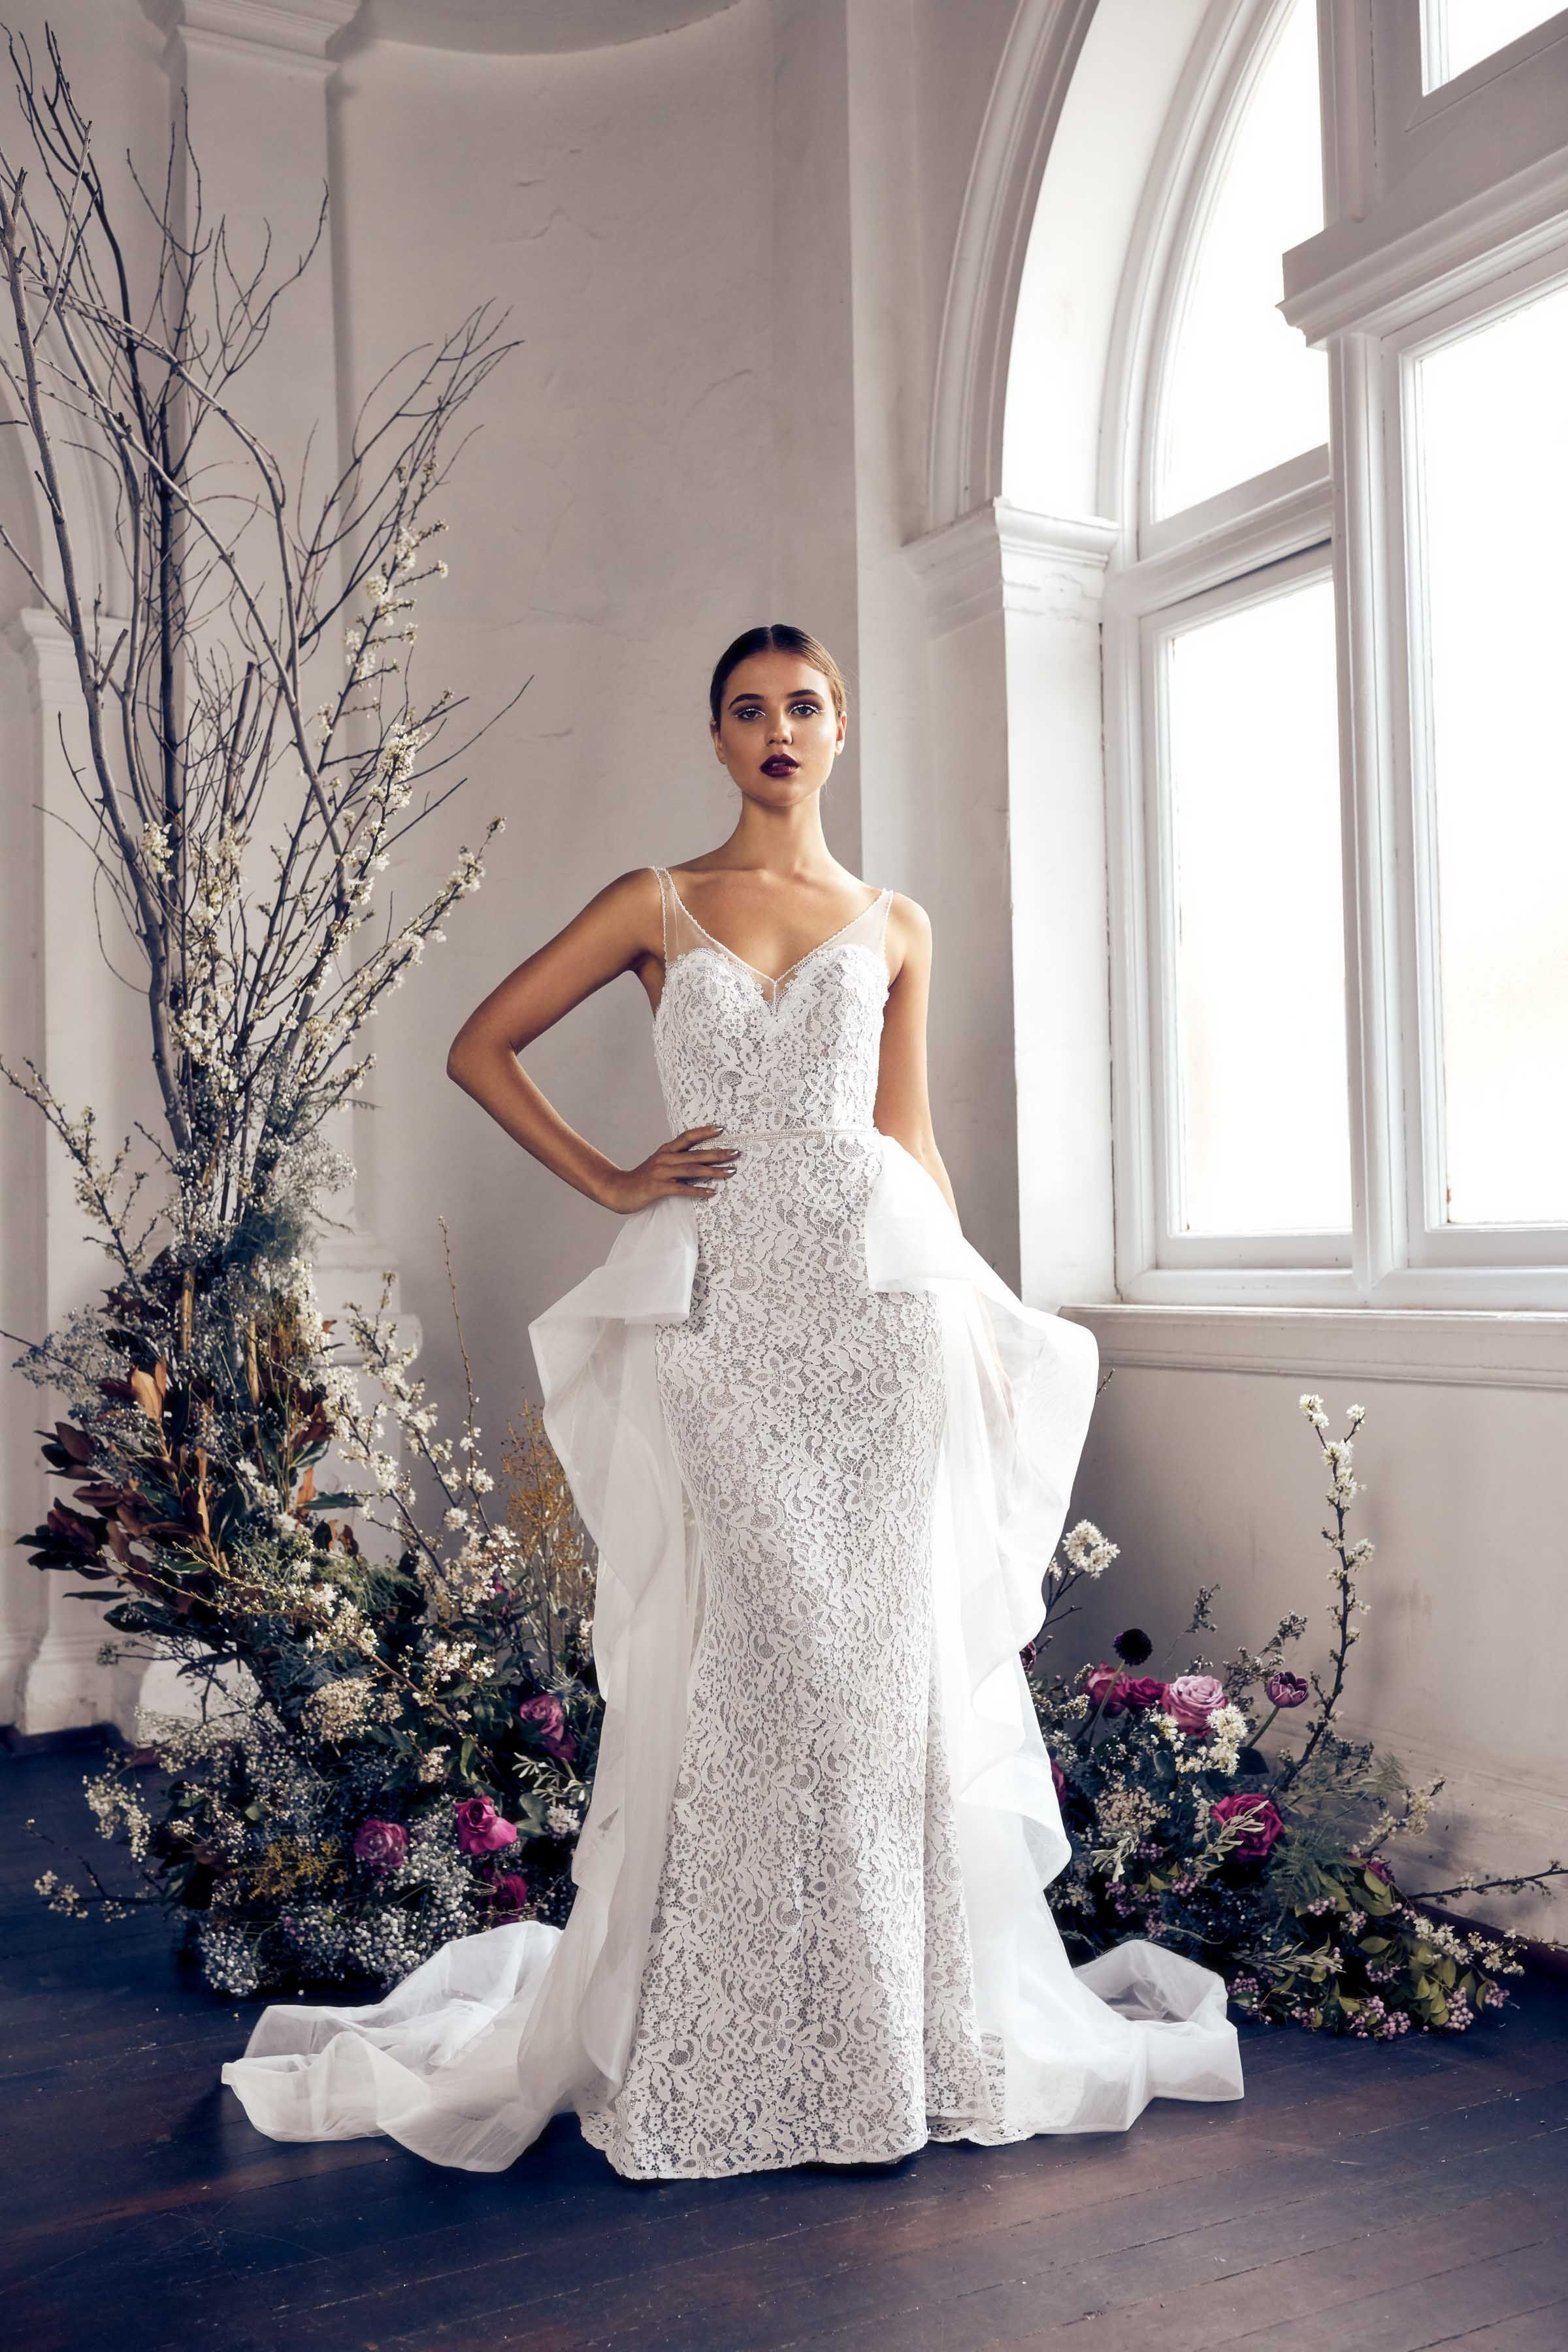 Zb 329 Wedding Dress Brands Rental Wedding Dresses Wedding Dress Hire